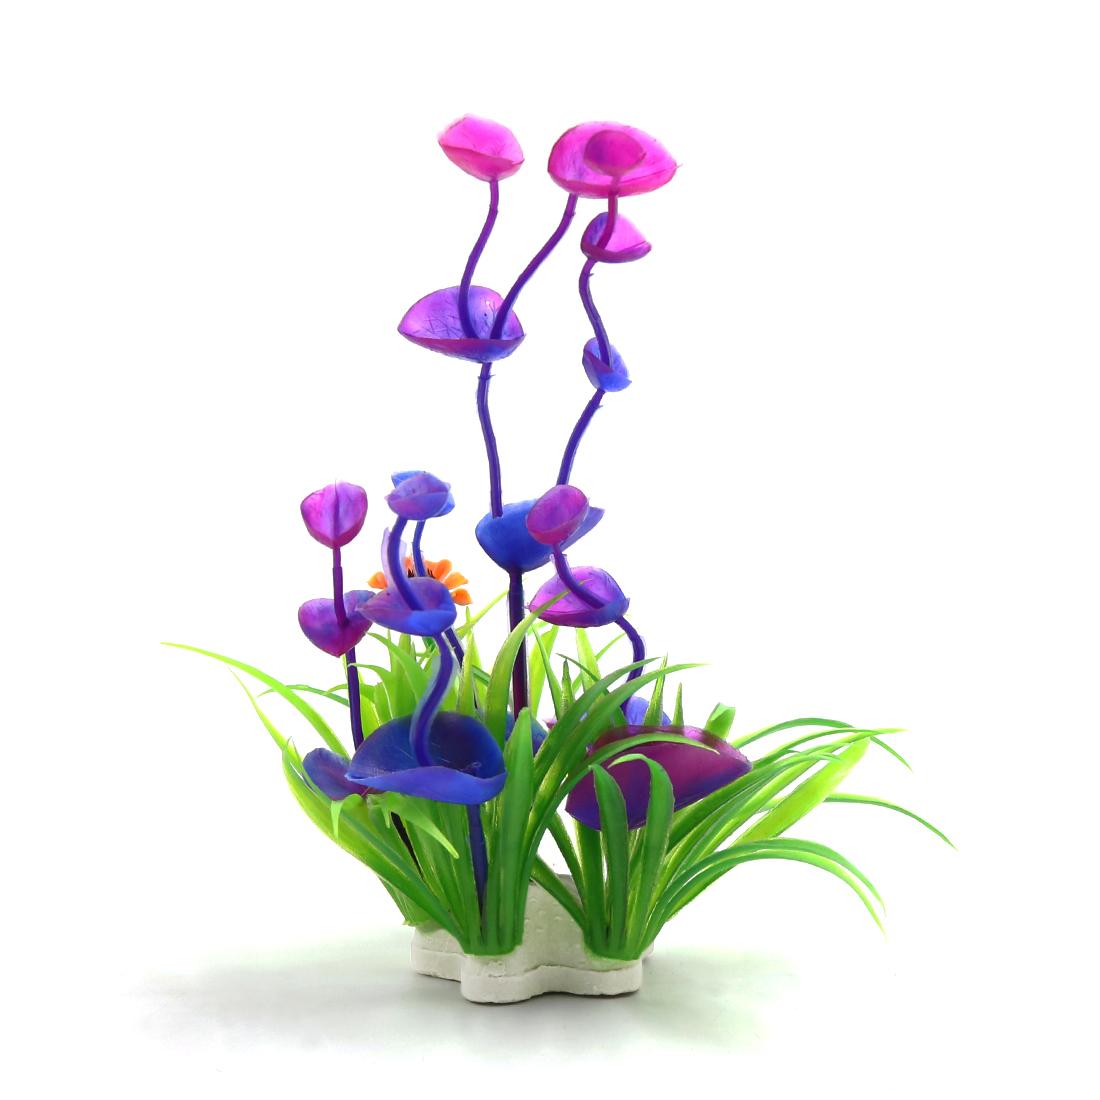 2pcs Purple Plastic Plant Betta Tank Fishbowl Aquascape Decor Ornament w/ Stand - image 1 of 3